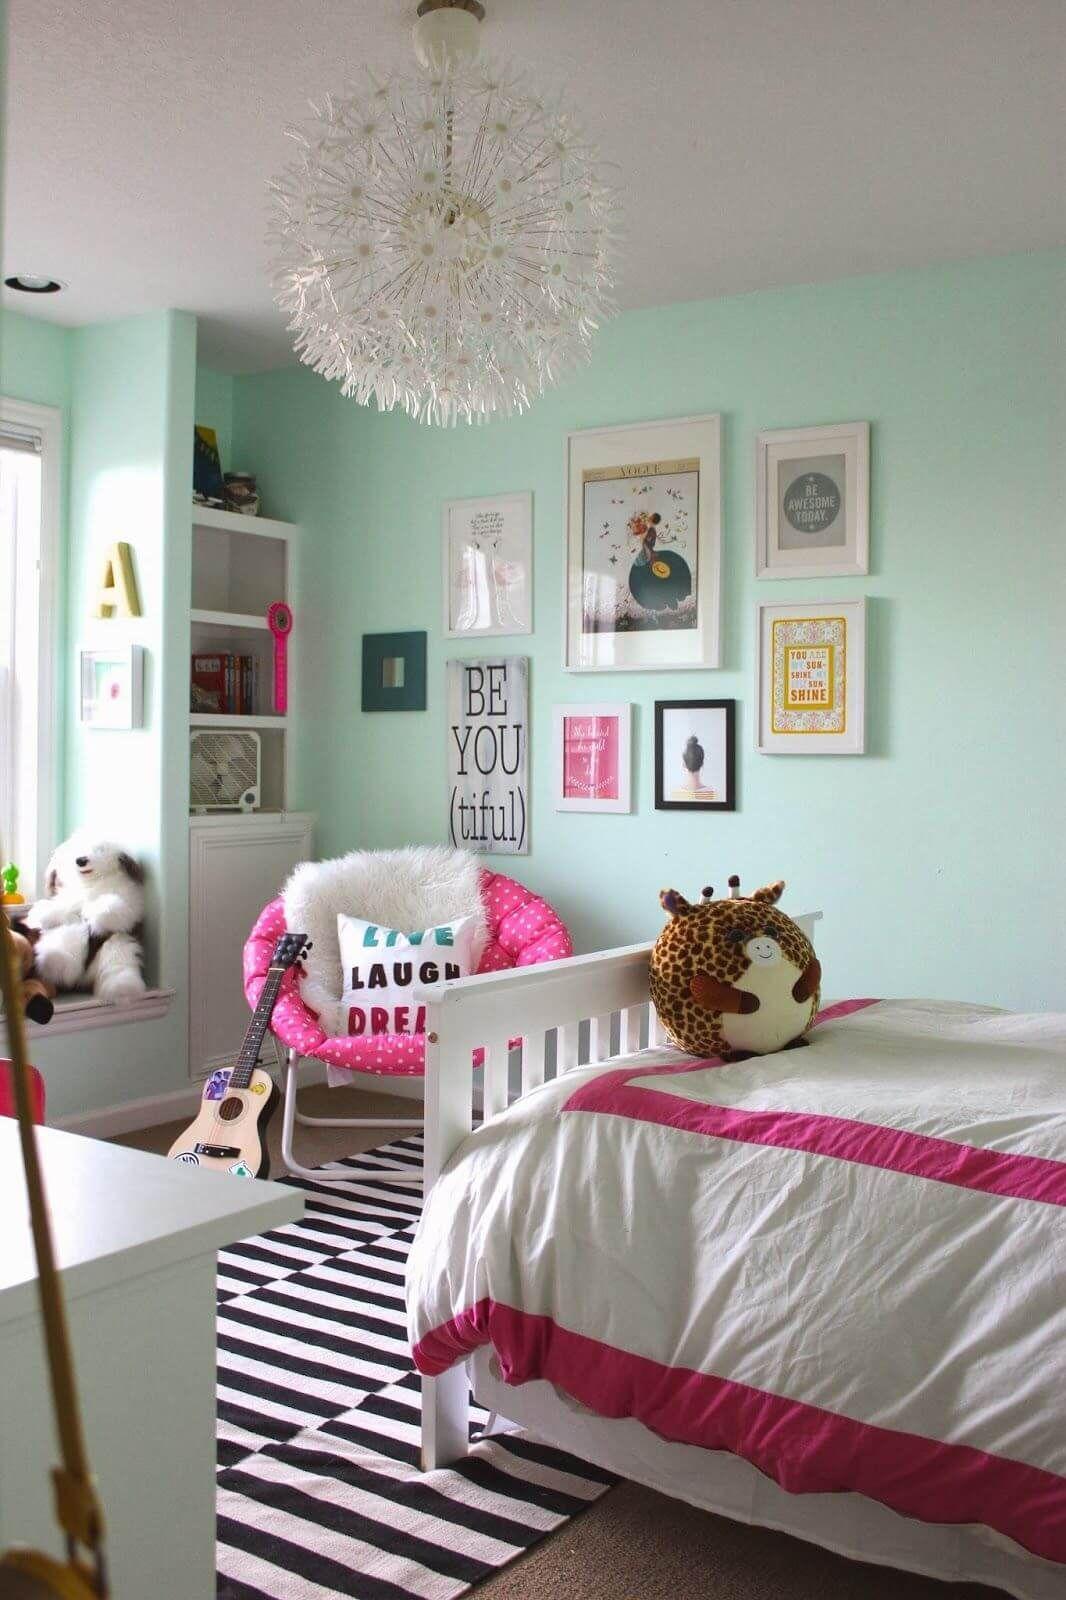 Teenage Girl Bedroom Ideas For A Teenage Girl Or Girls May Be A Little Tricky Because She Has Grown Diy Girls Bedroom Tween Bedroom Makeover Tween Girl Bedroom